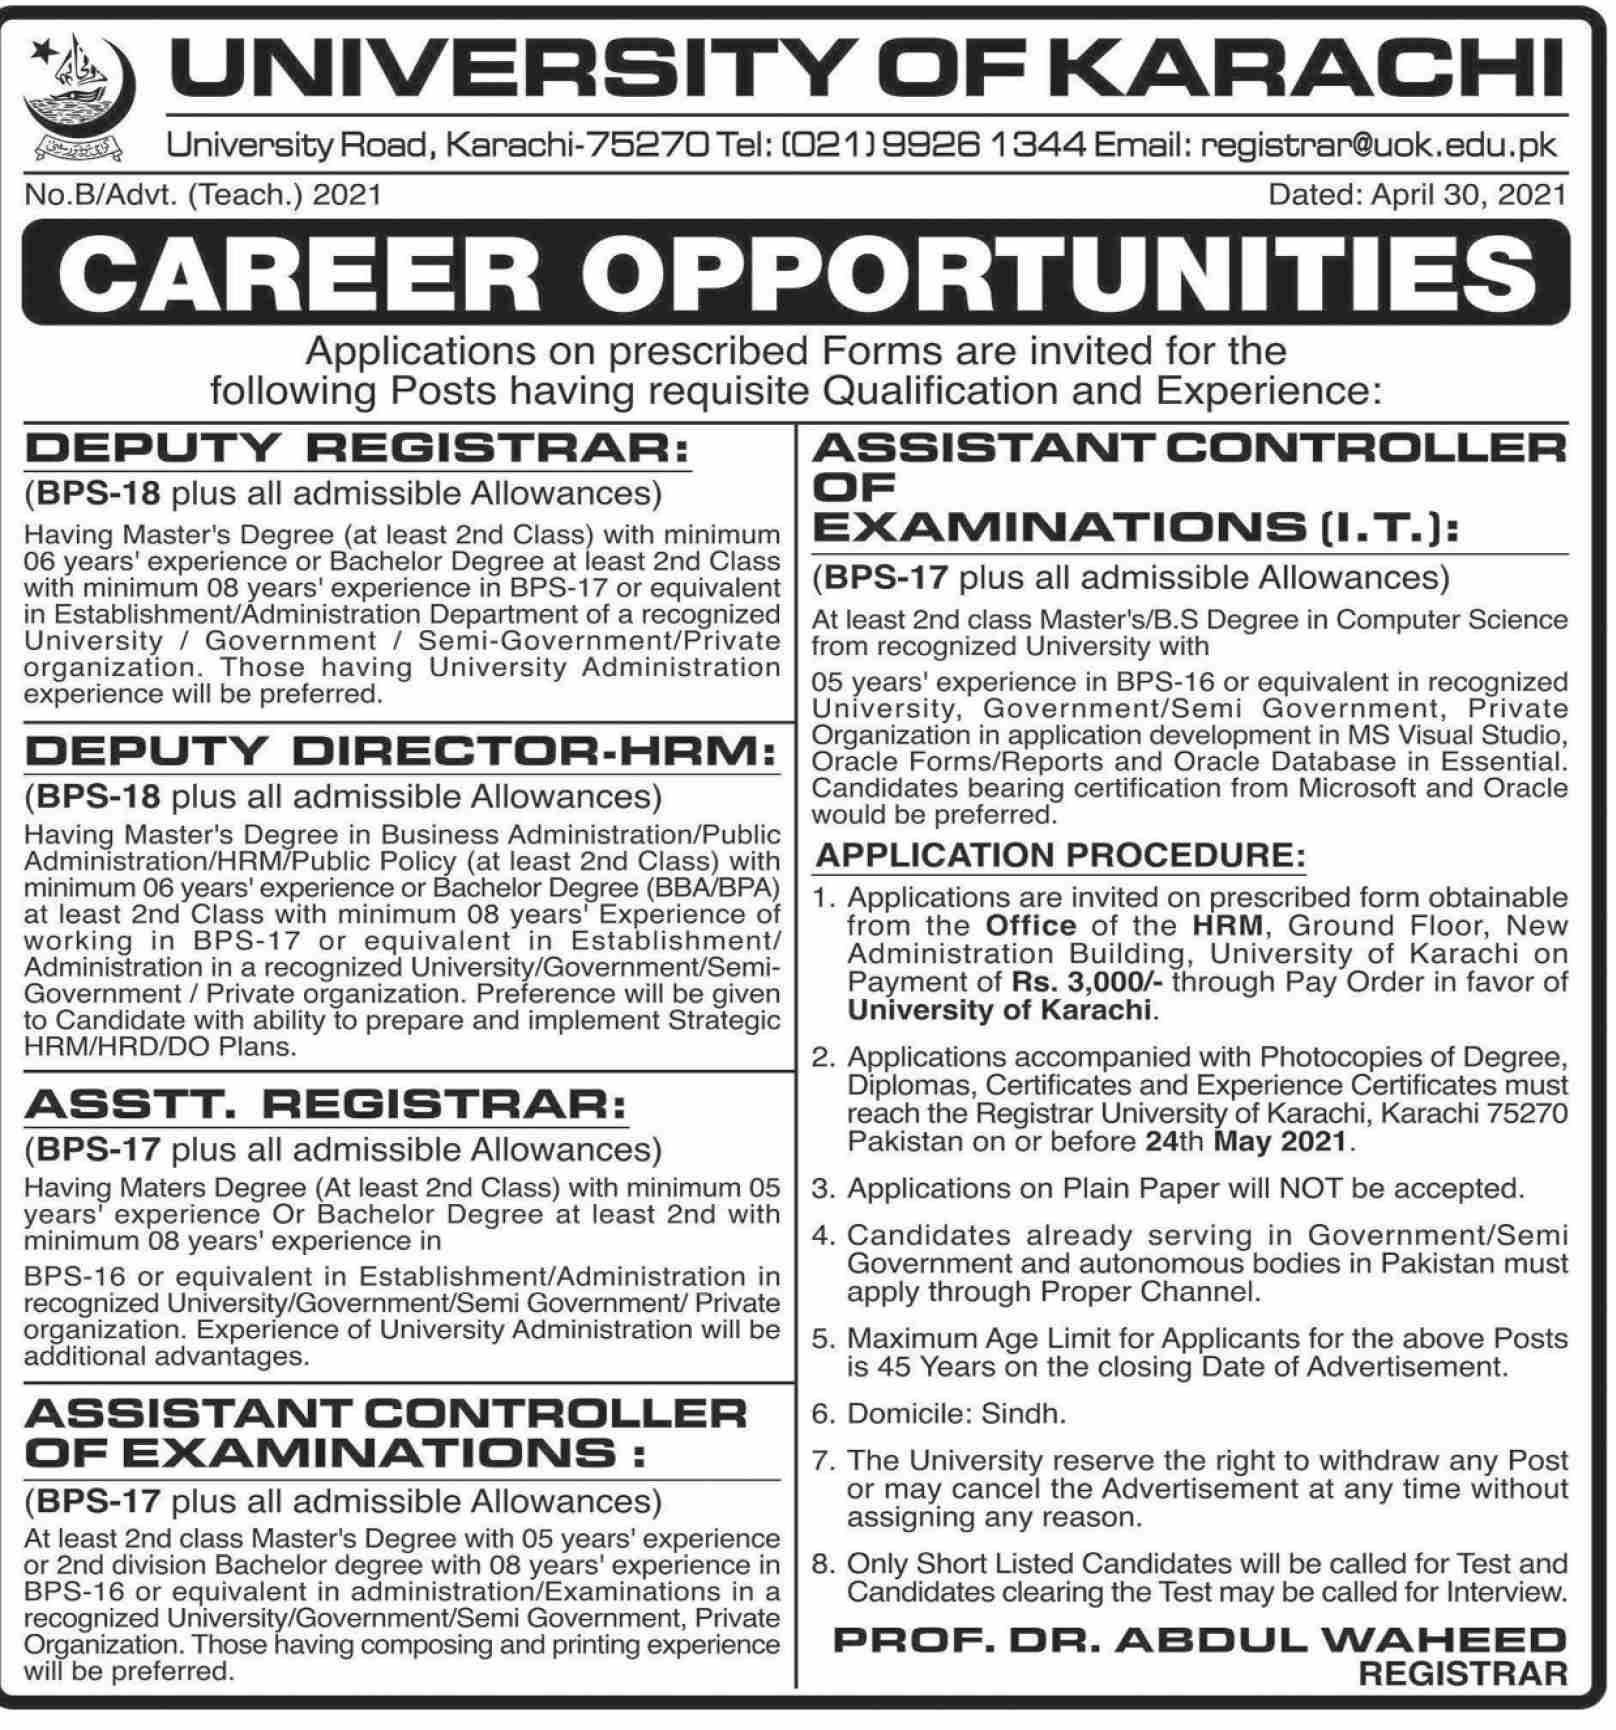 University of Karachi (UOK) Jobs 2021 in Pakistan